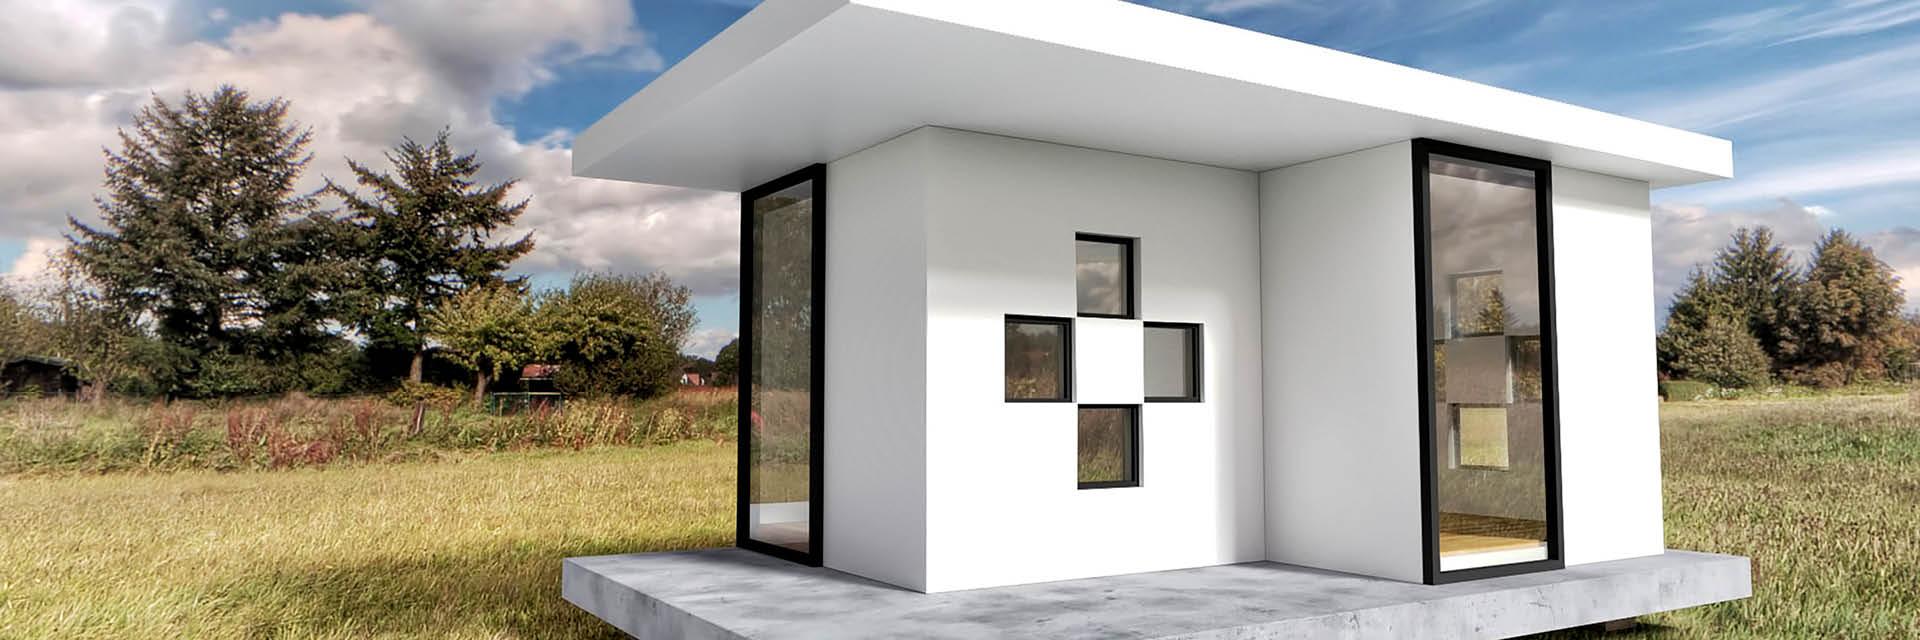 Tiny House Kleines Haus Ganz Gross